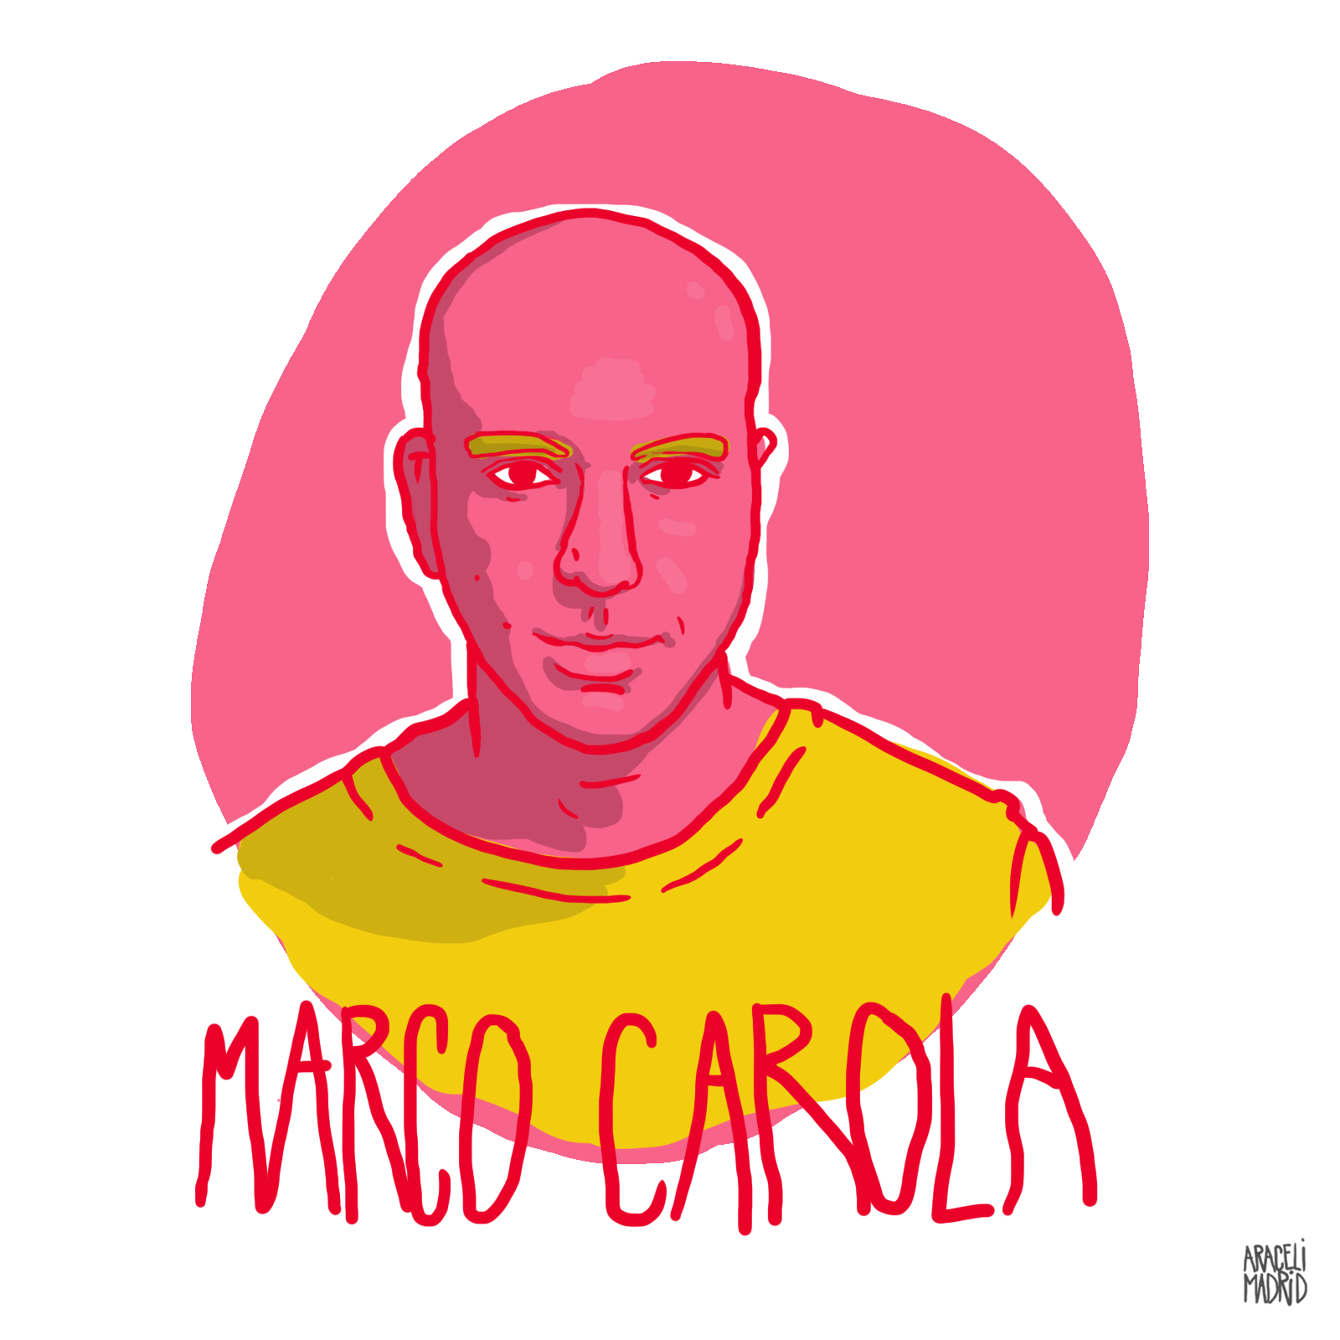 Marco Carola Djs ilustrados